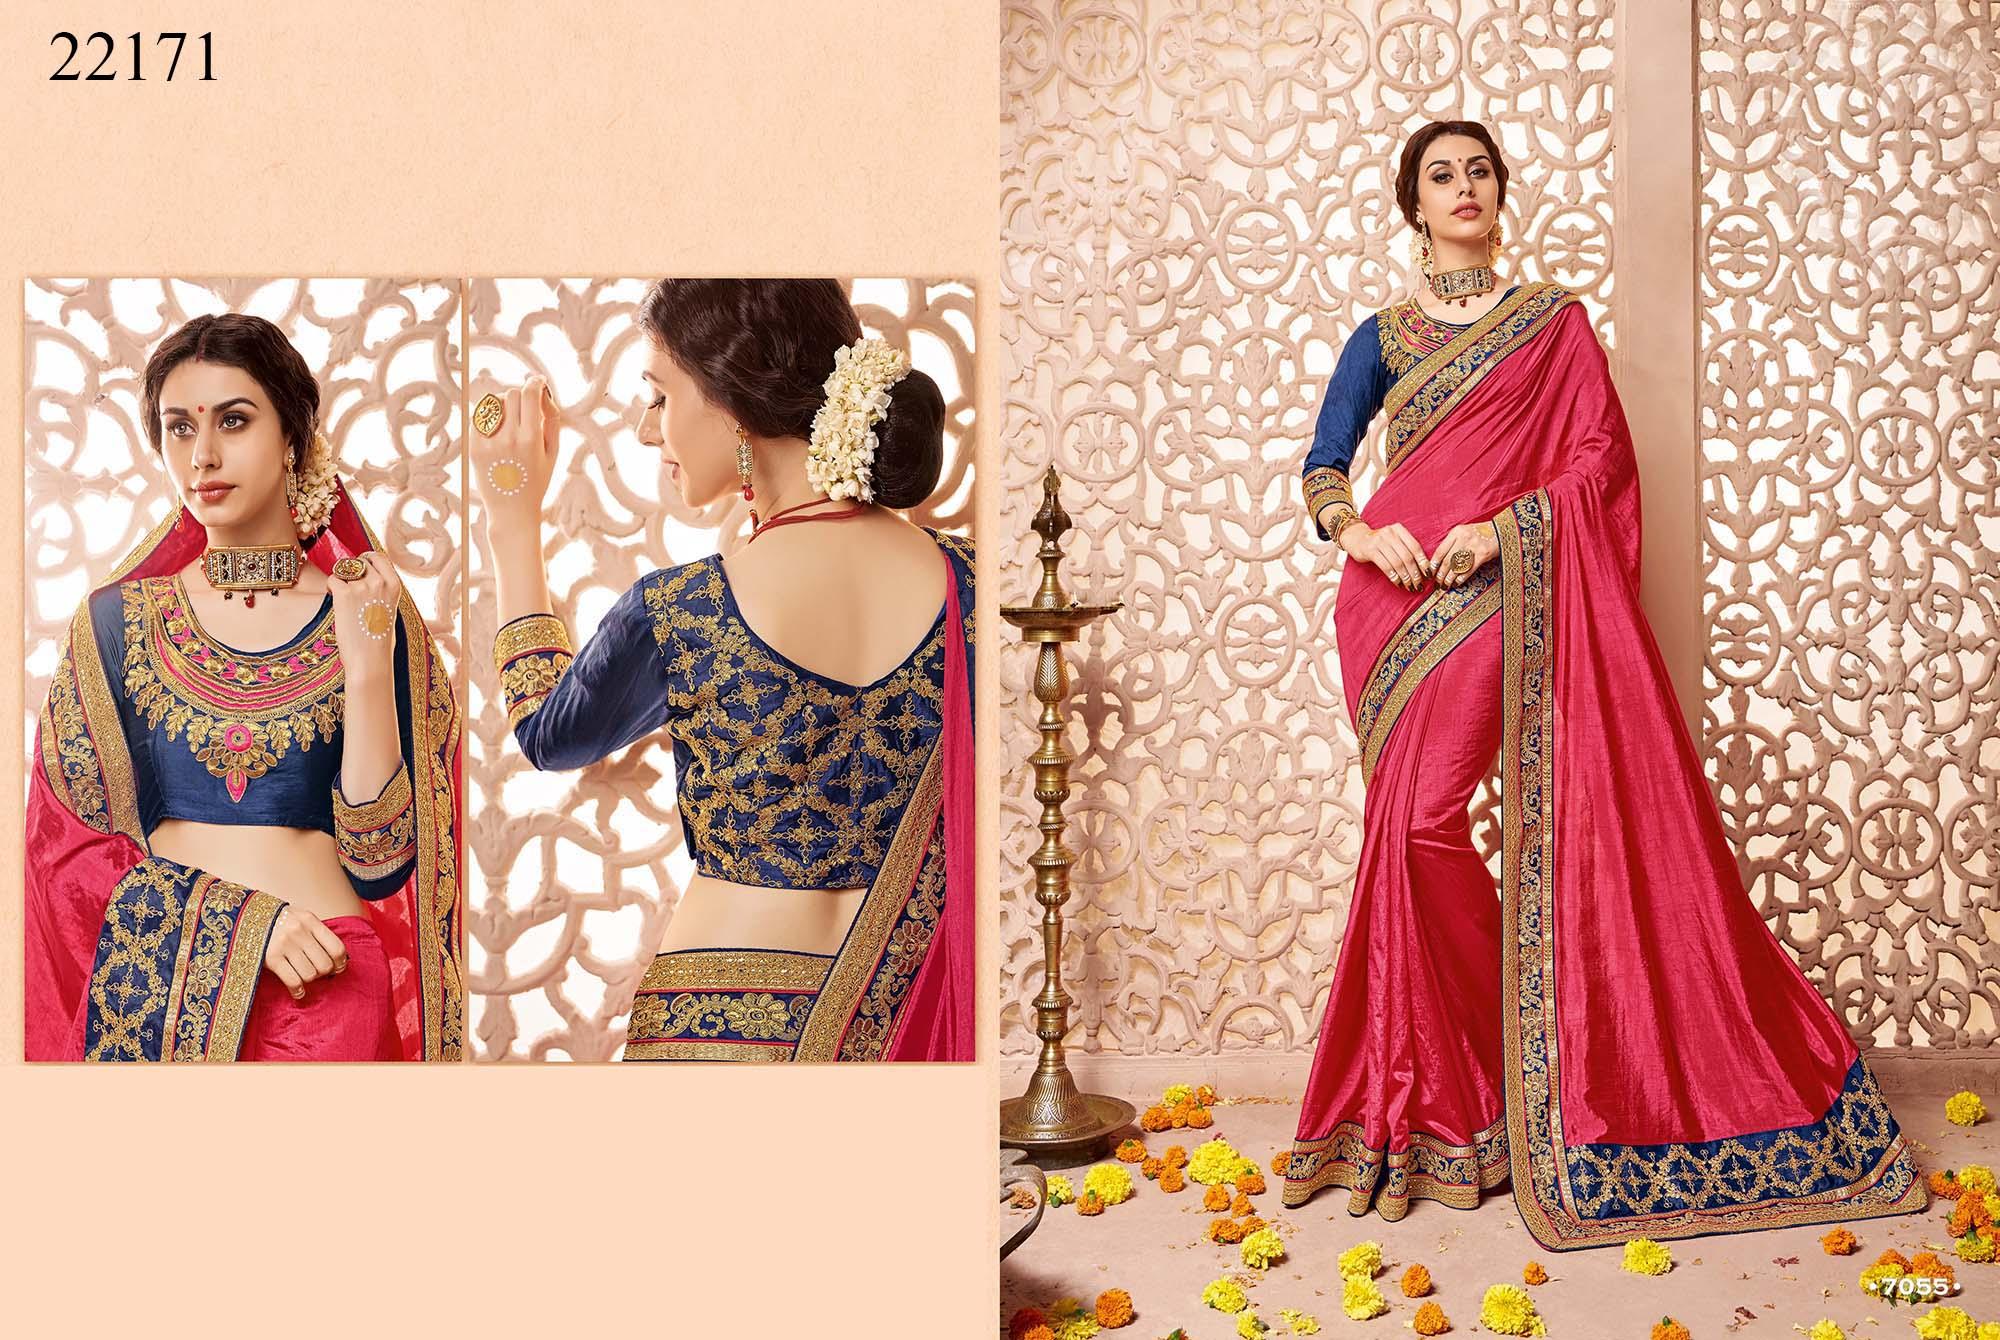 Newly Wedded Bridal Saree Dania 22171 | Bride Special